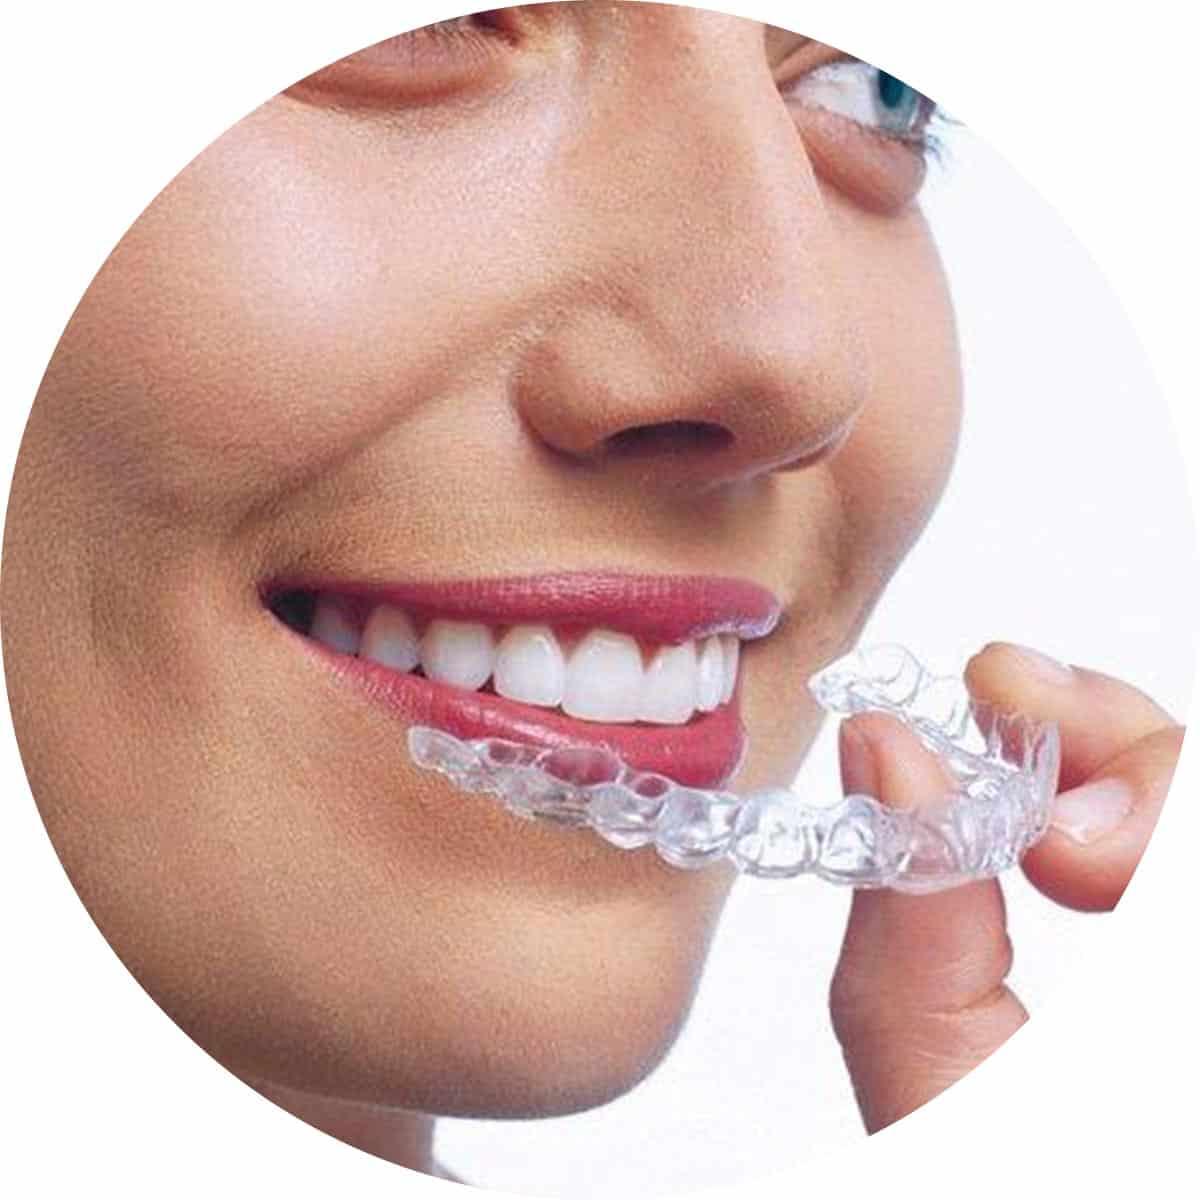 Invisalign Clear Aligner Dental Care